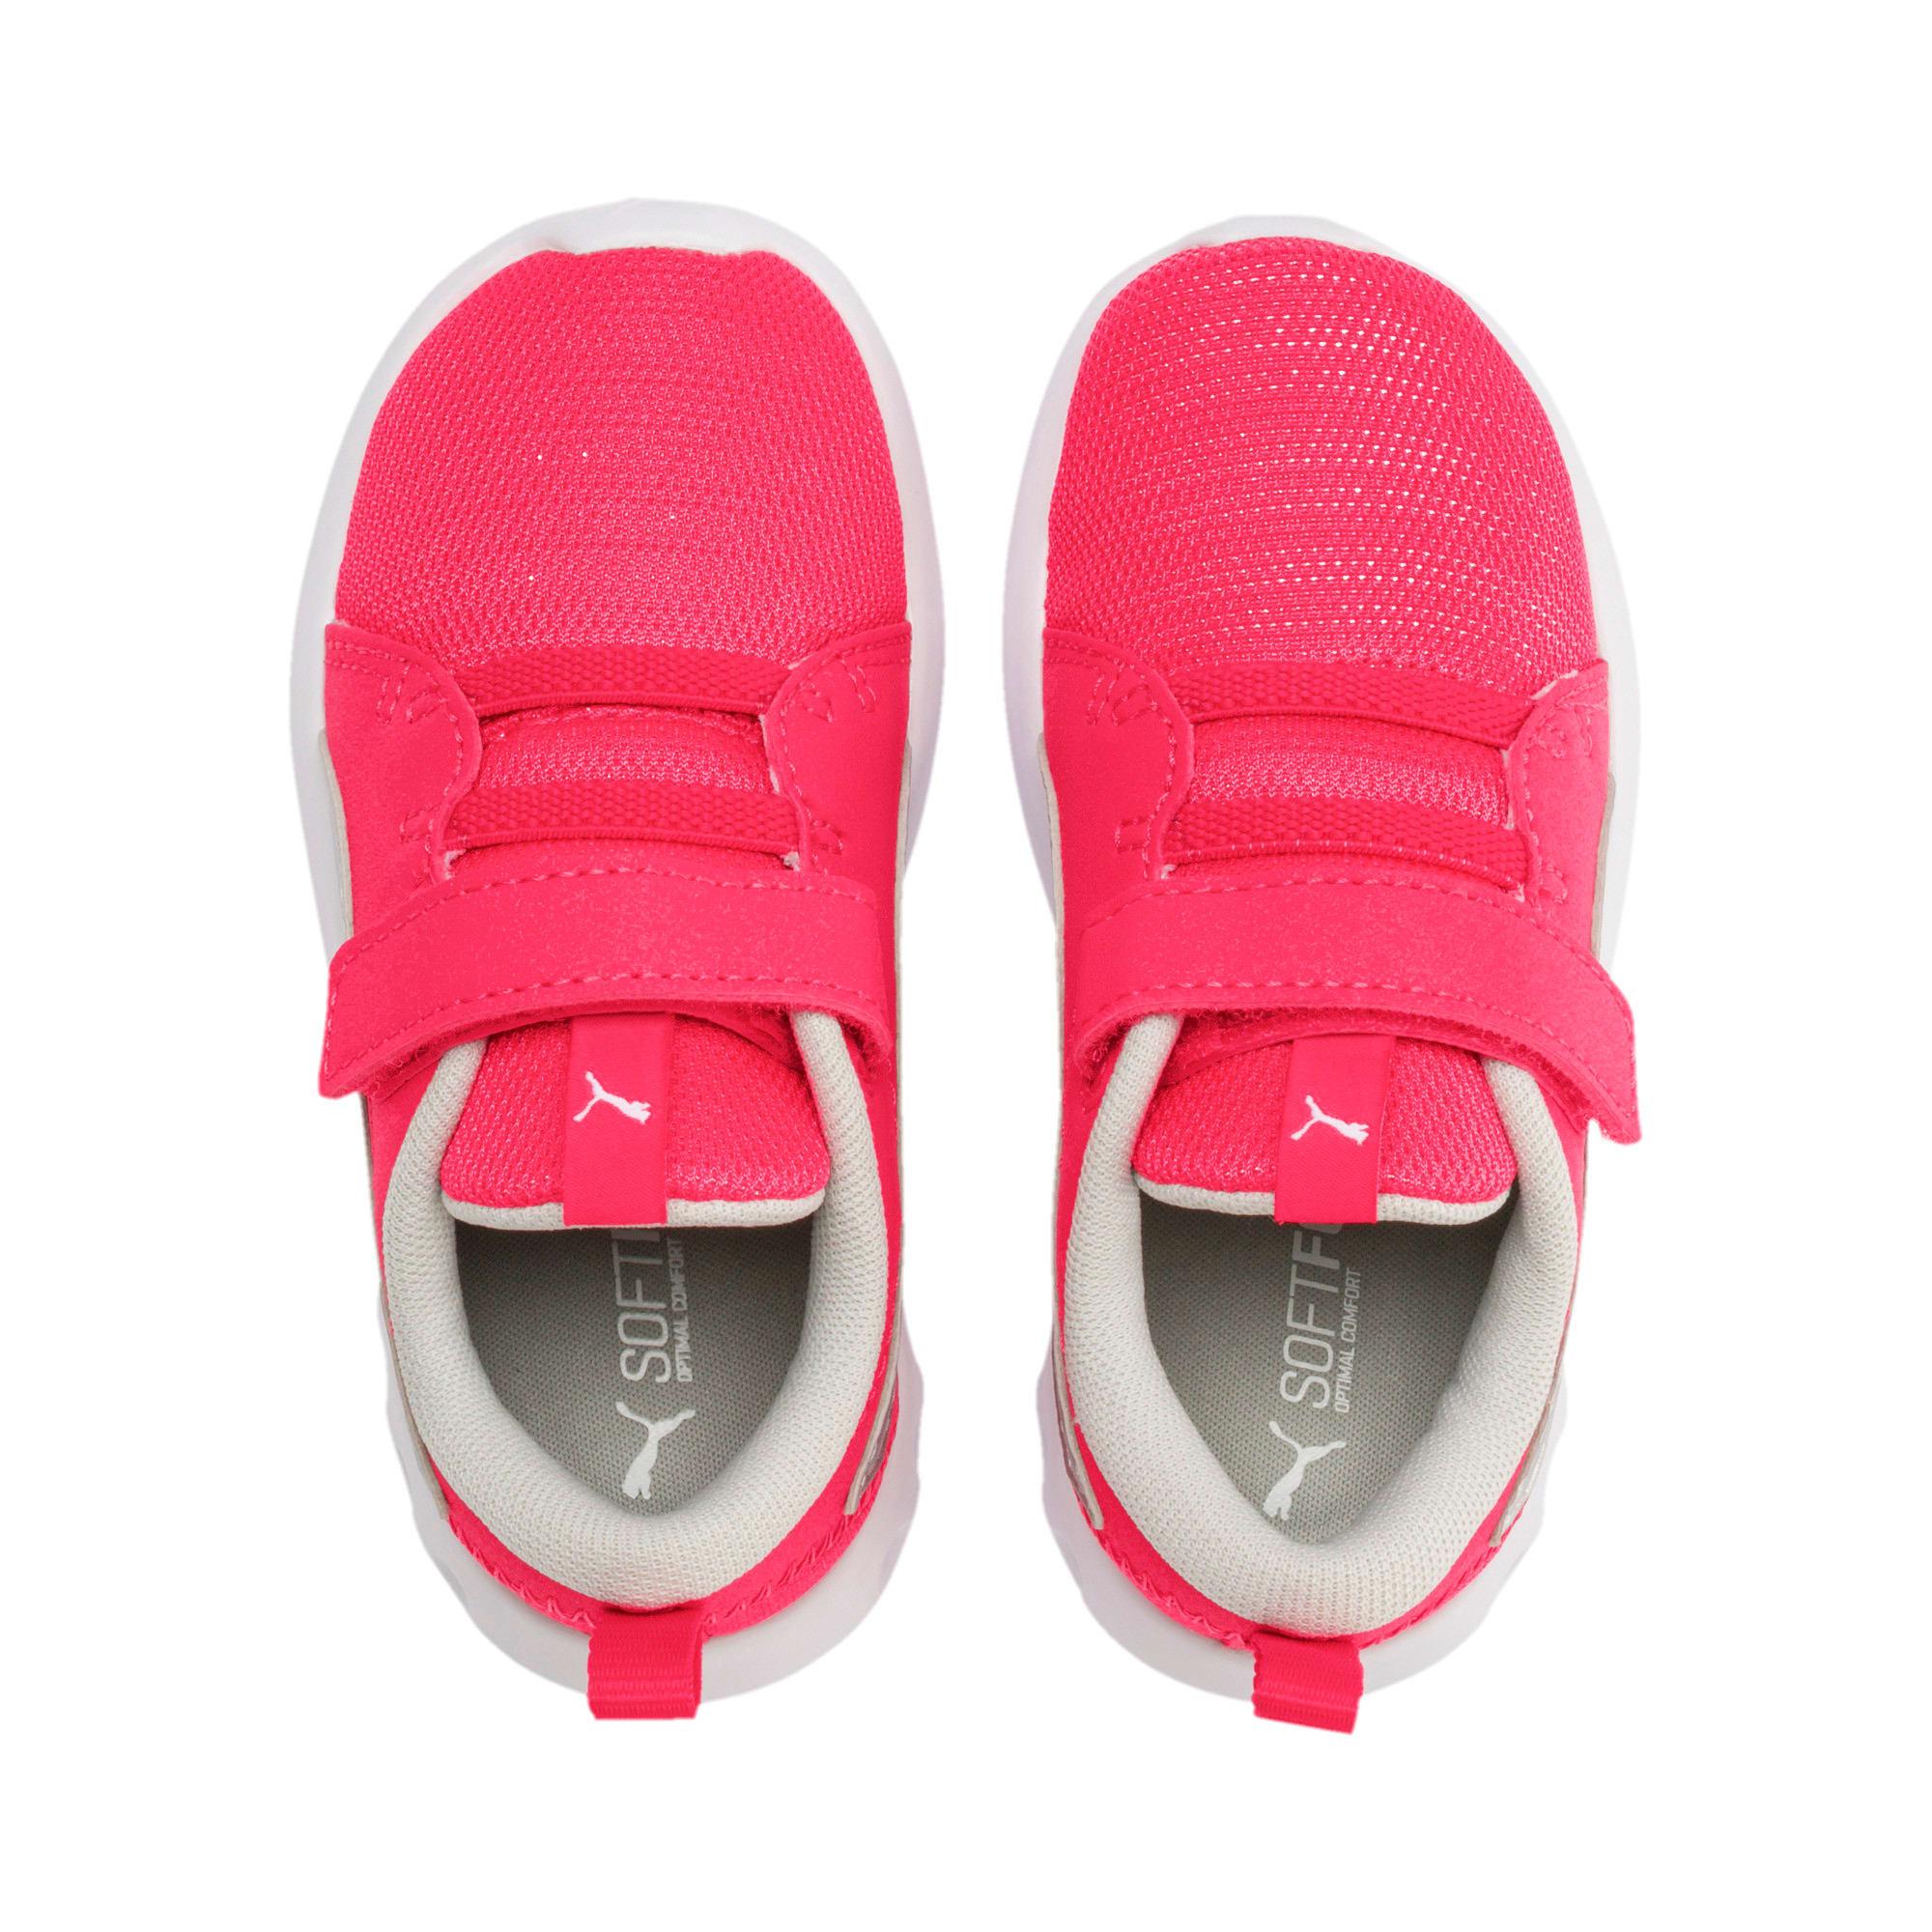 Thumbnail 6 of Carson 2 Glitz Toddler Shoes, Nrgy Rose-Silver, medium